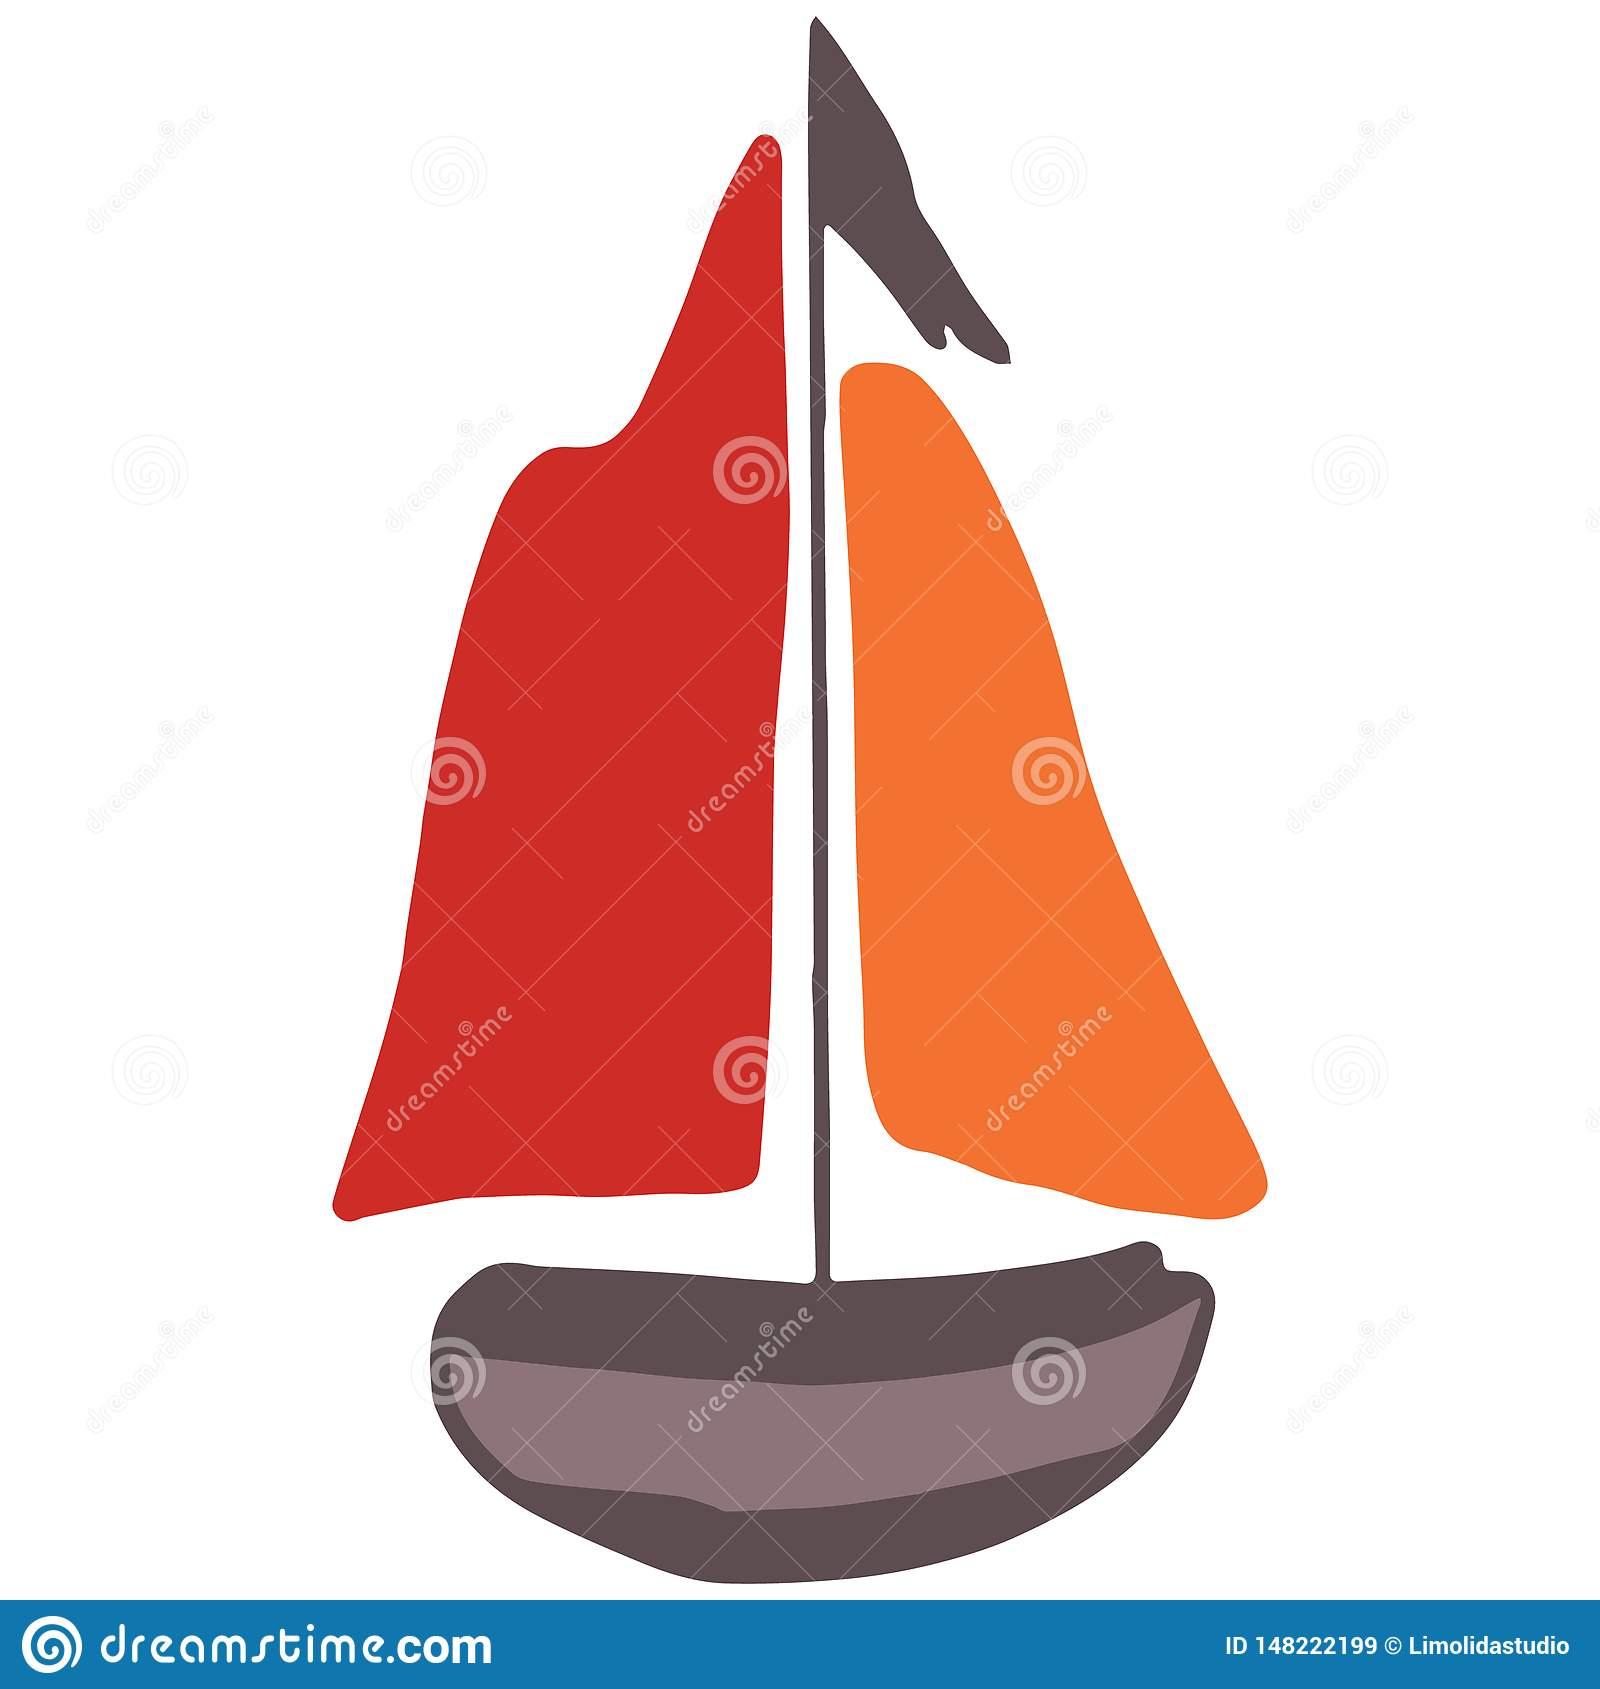 Cute Wooden Boat Cartoon Vector Illustration Motif Set. Hand Drawn.